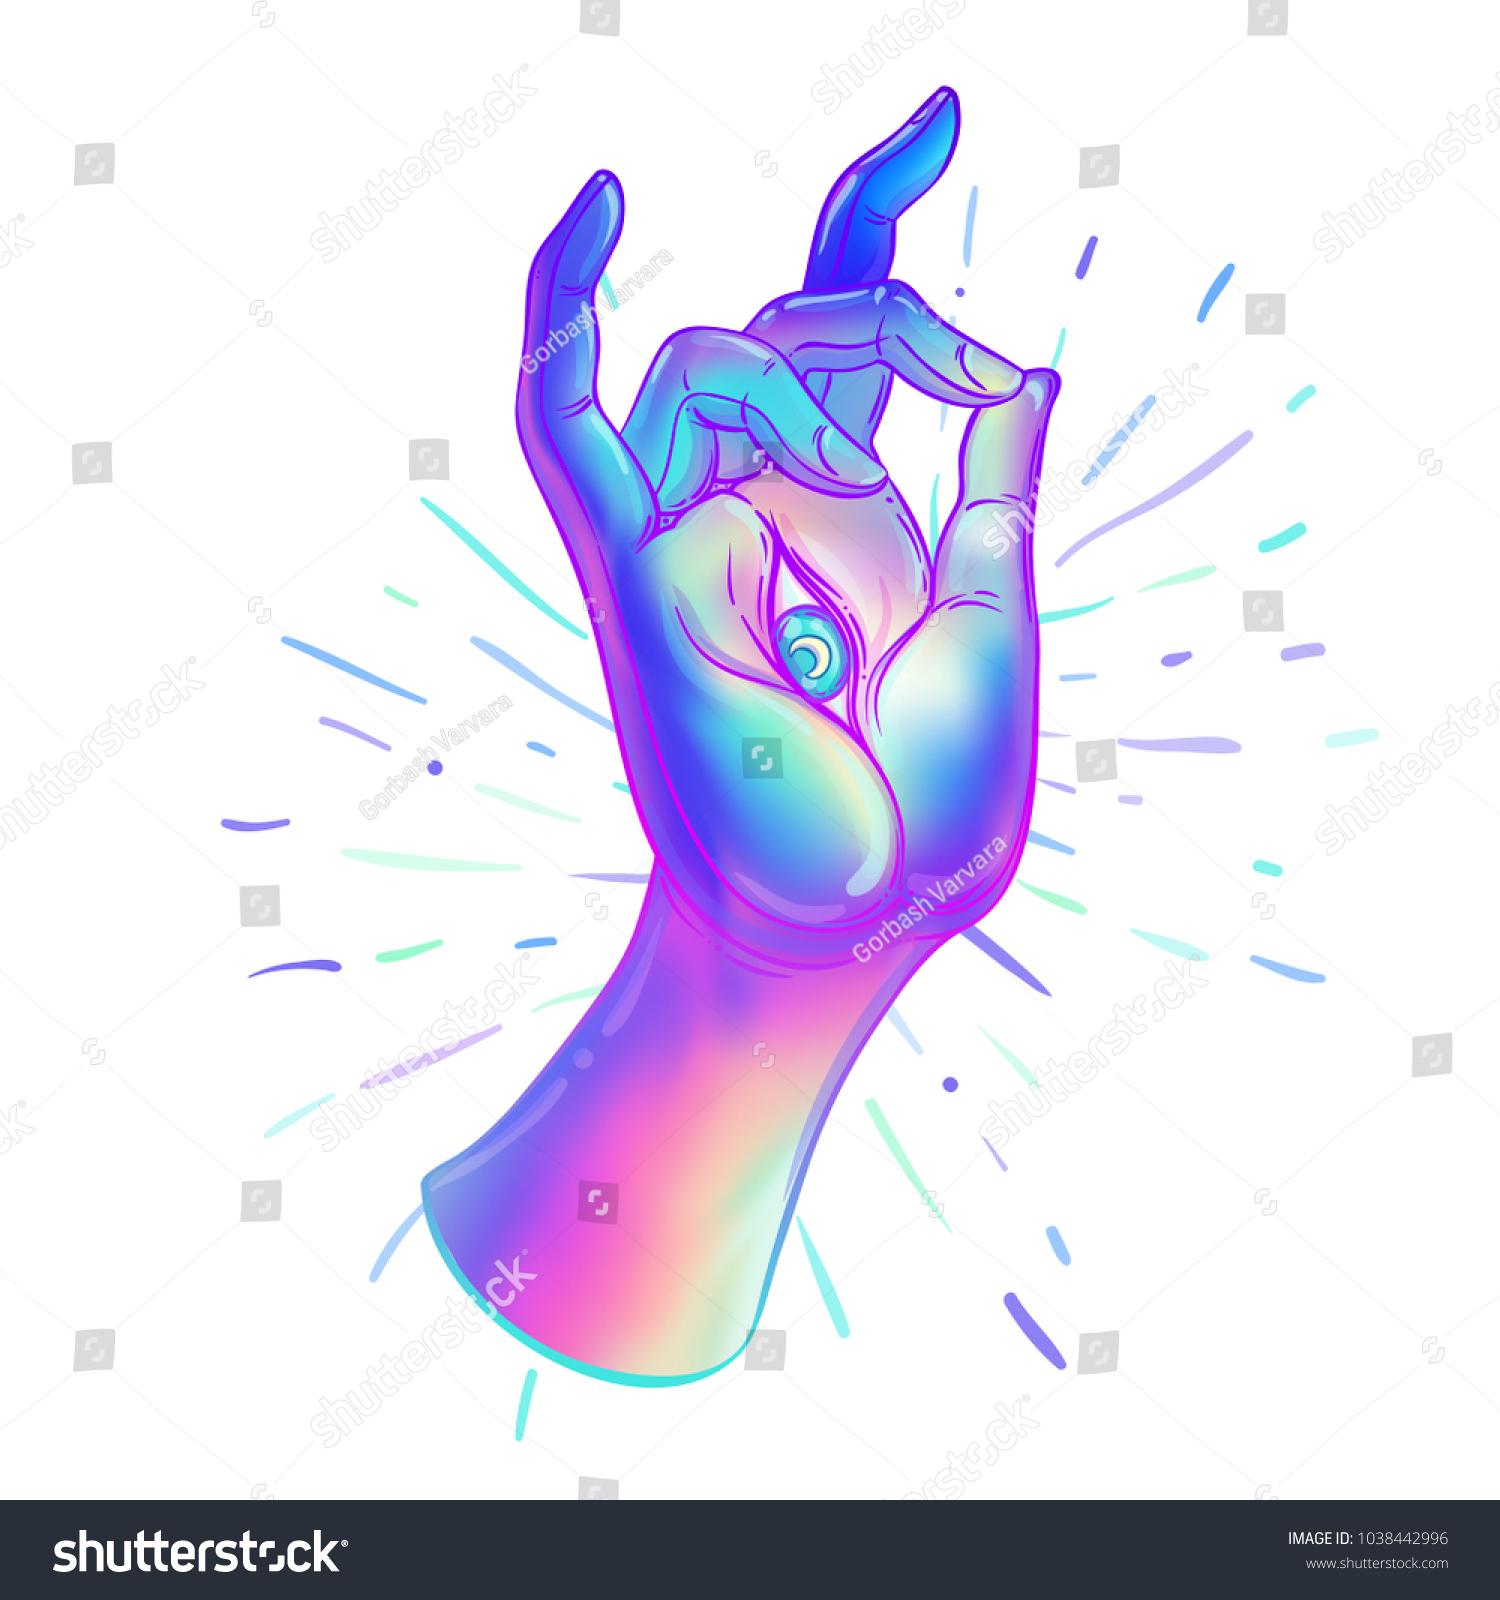 Lord buddhas hand allseeingl eye psychedelic stock vector lord buddhas hand with all seeingl eye psychedelic colors hand drawn colorful illustration biocorpaavc Choice Image